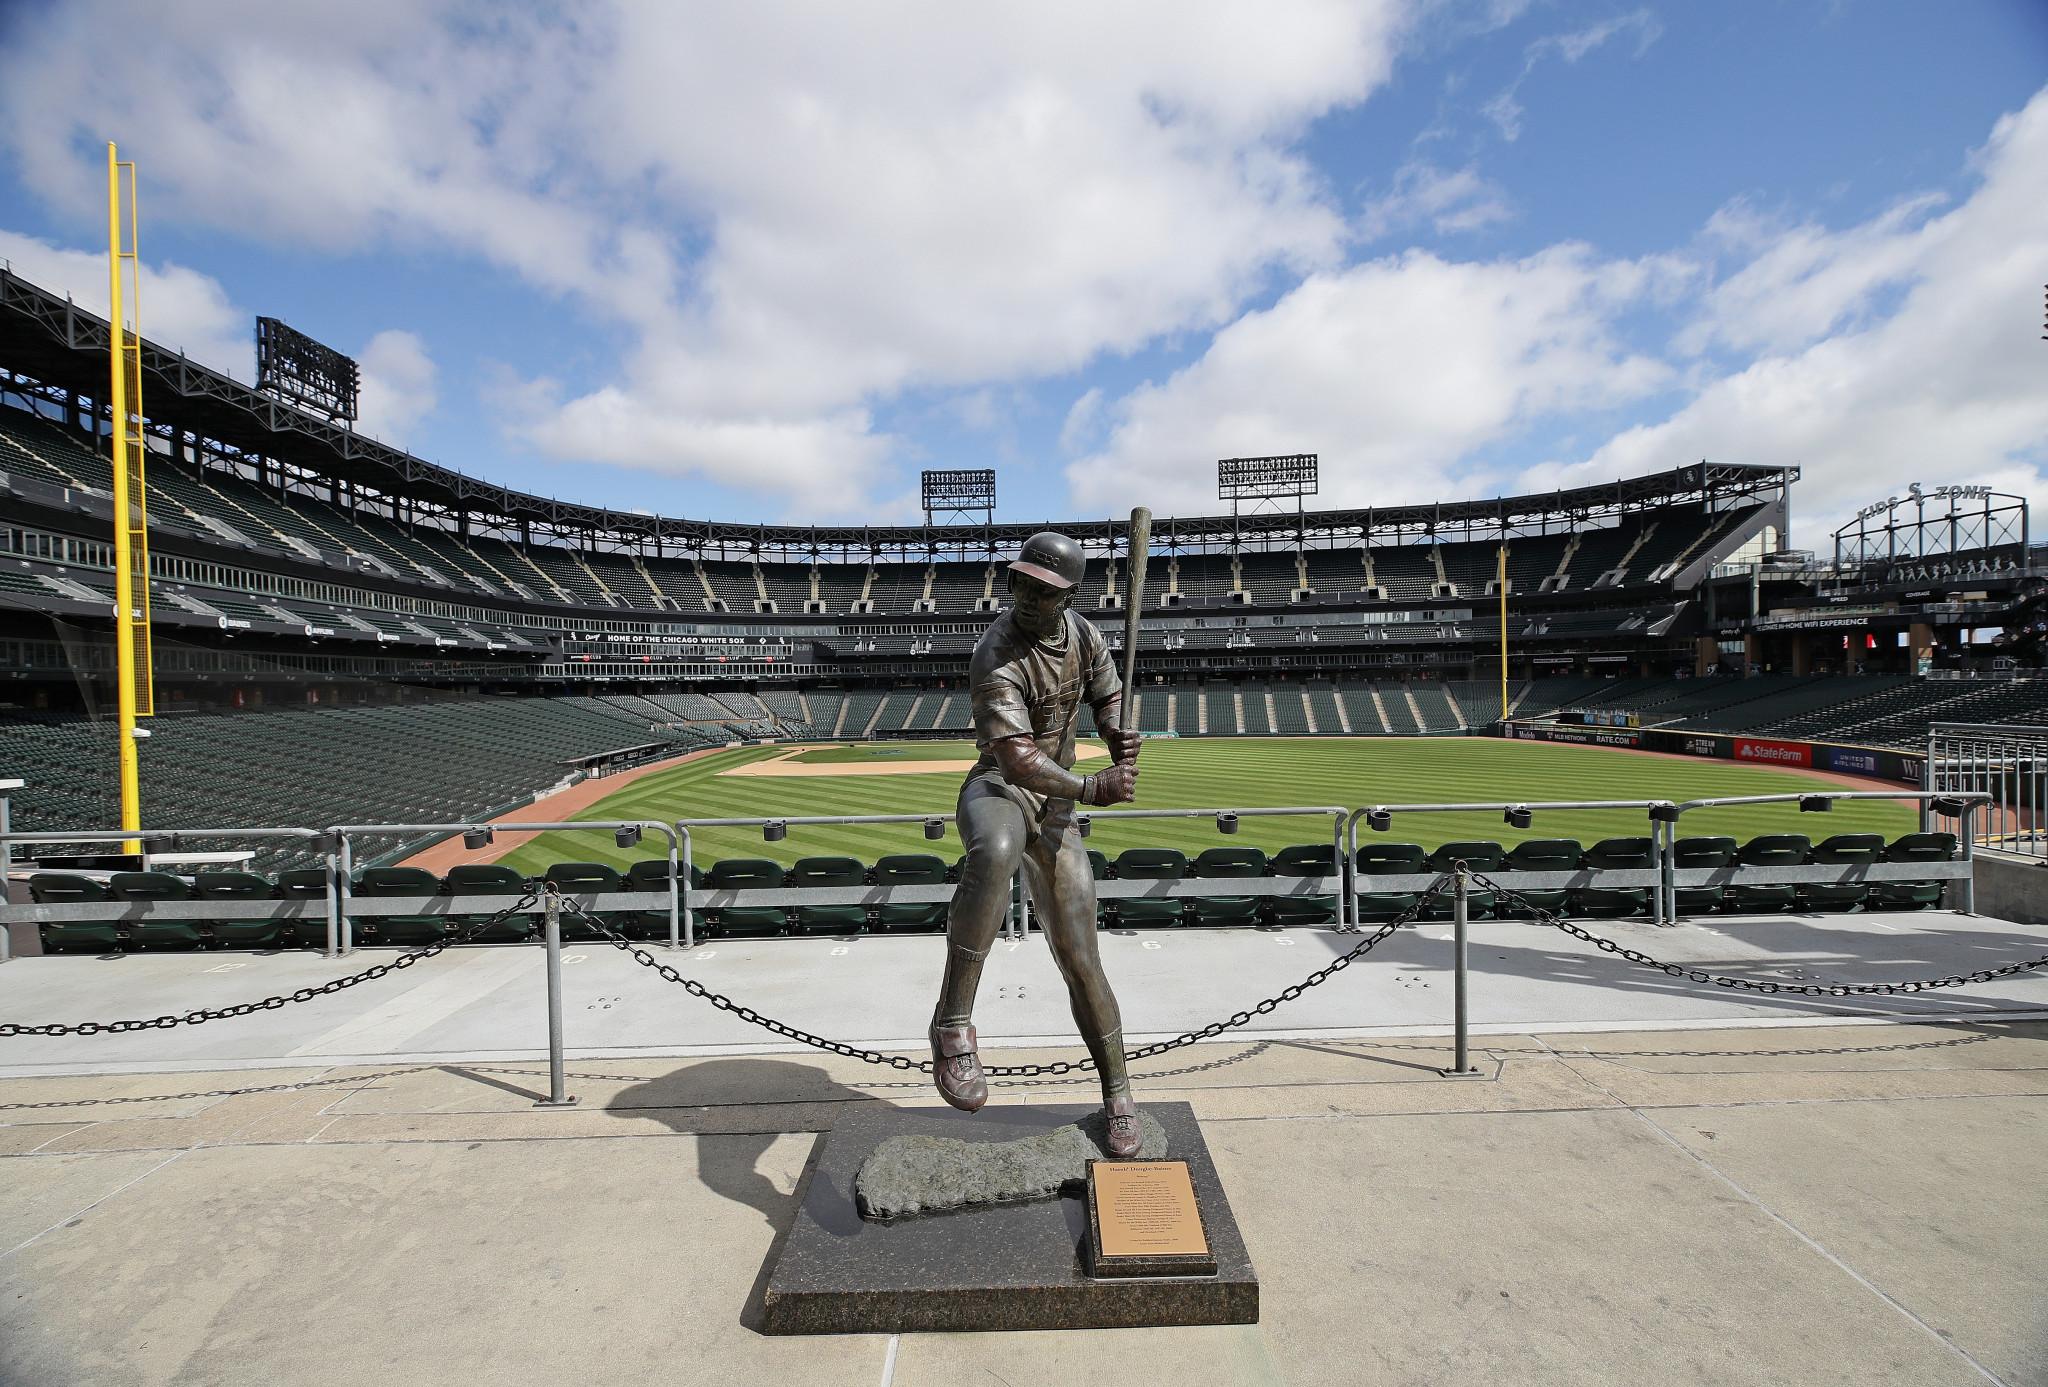 Major League Baseball reportedly eyeing July start to season